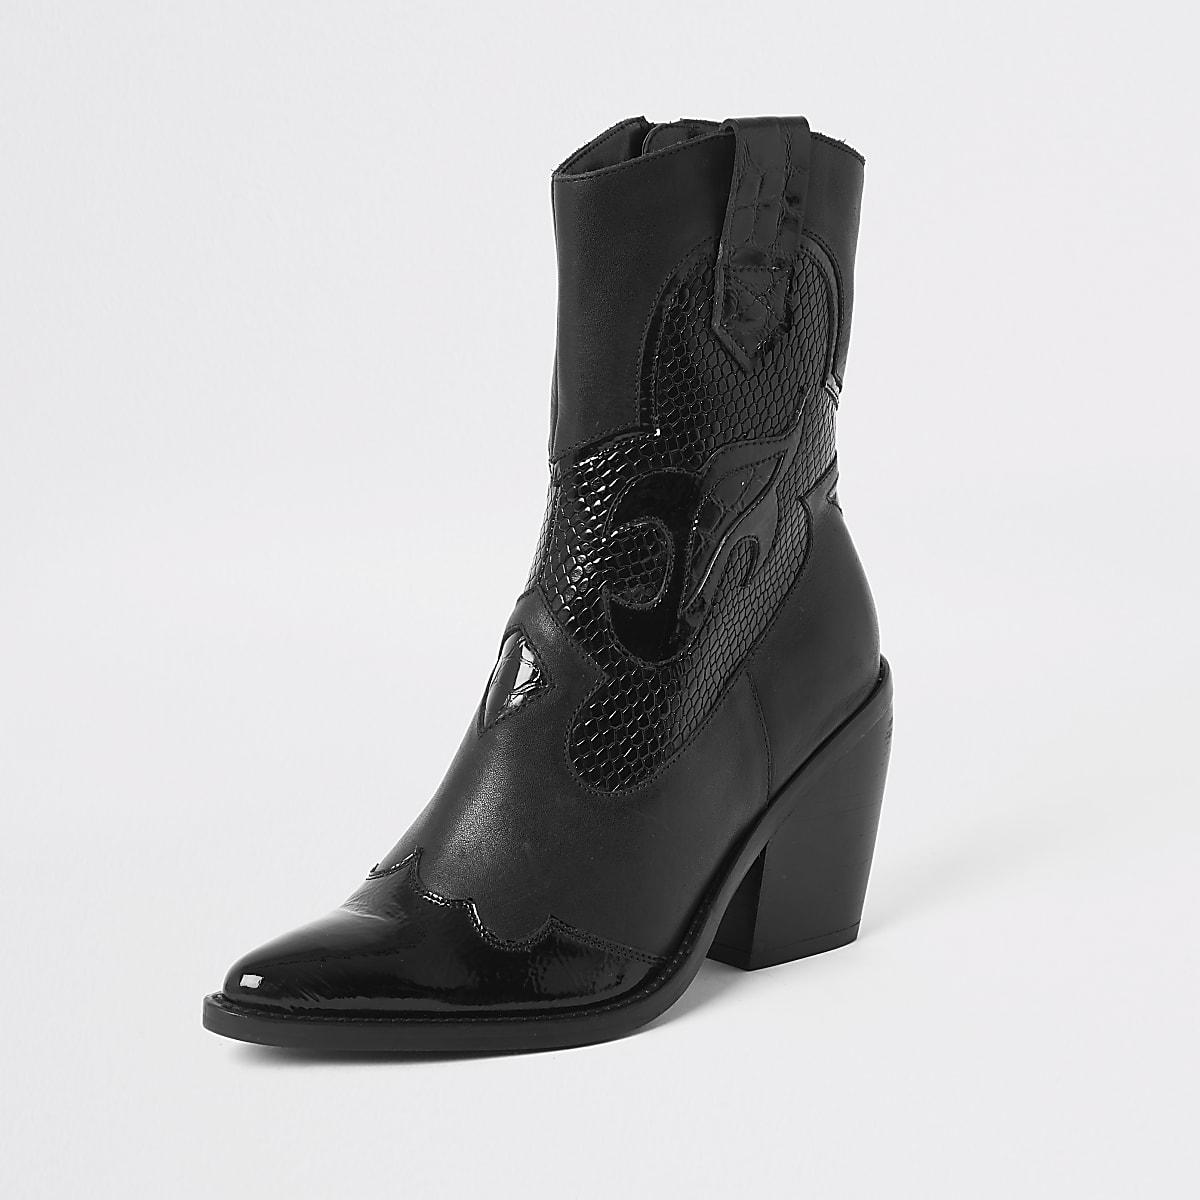 a2e3f50738b Black leather cutout cowboy ankle boots